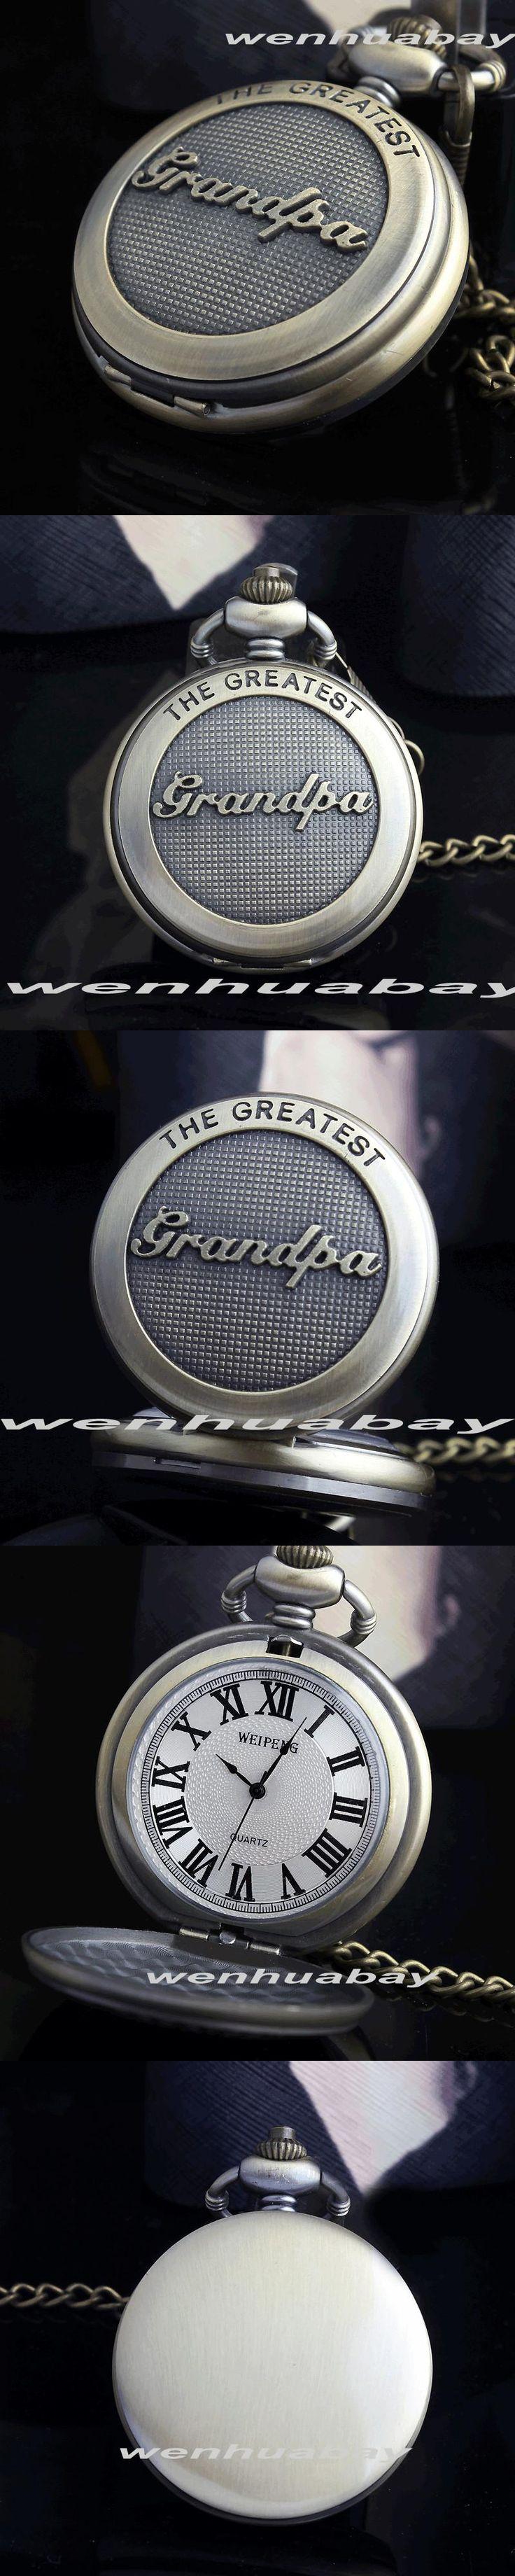 Bronze The Greatst Grandpa Retro Pocket Watch Big Size Necklace Fob Chain Roman Numberal Vintage Men's Grandpa Birthday Gift